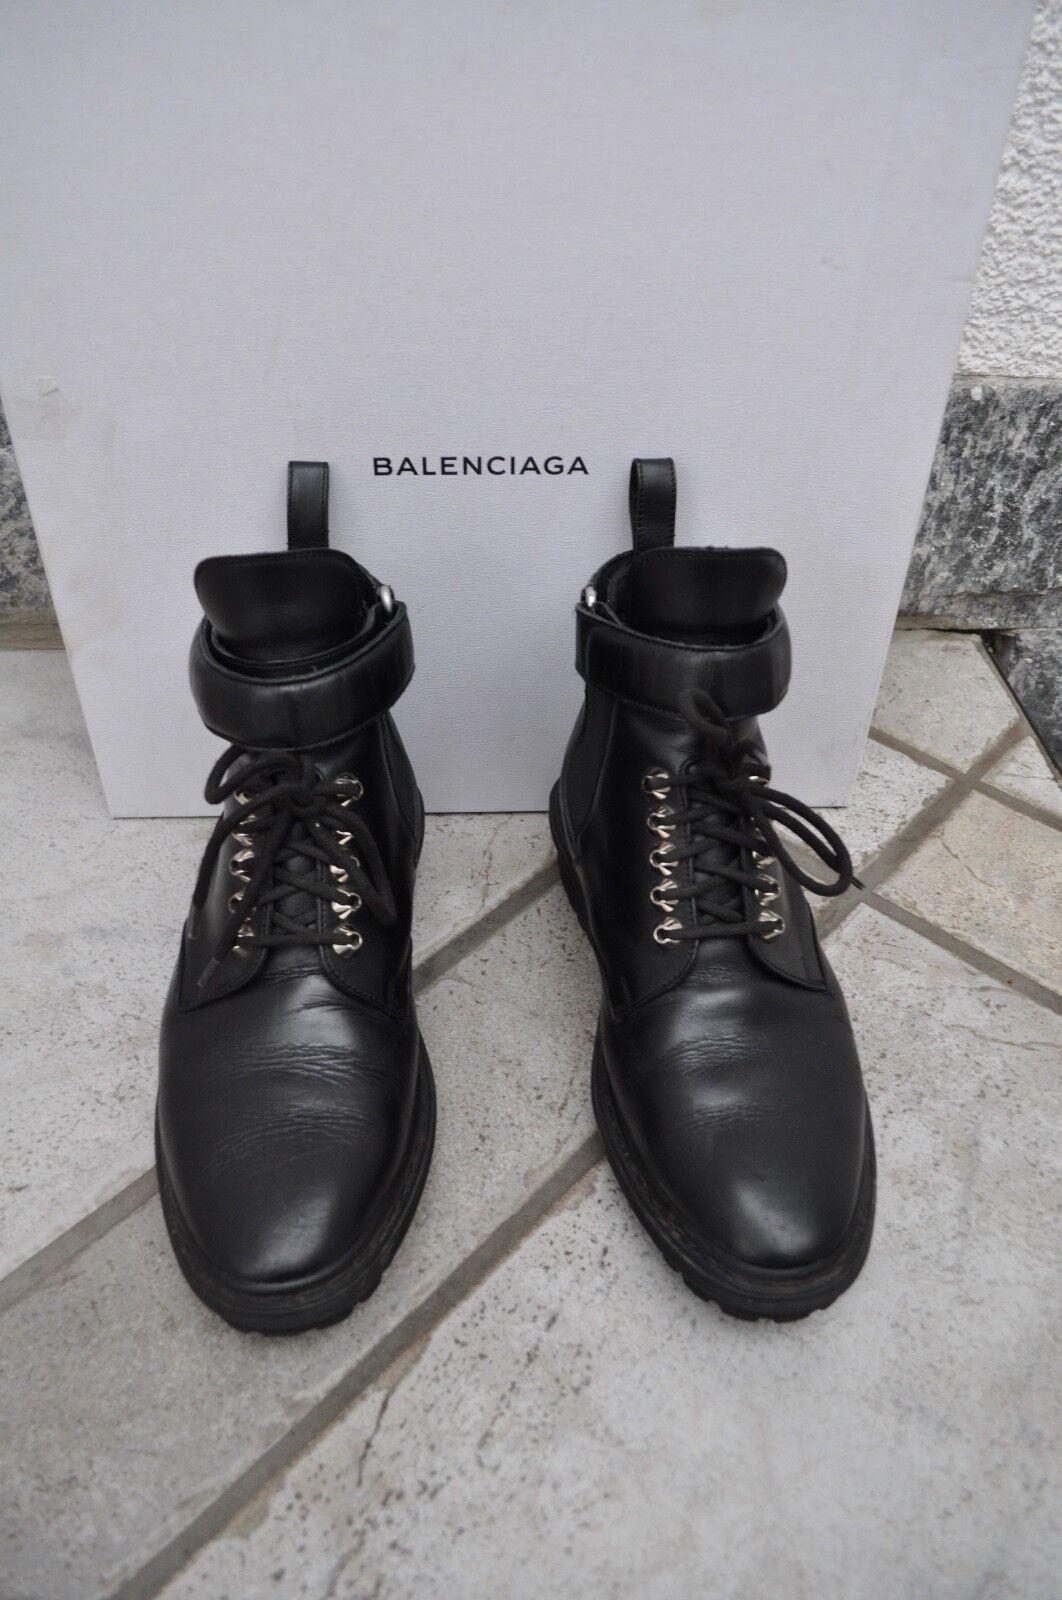 Balenciaga ankle Stiefel 38 schwarz